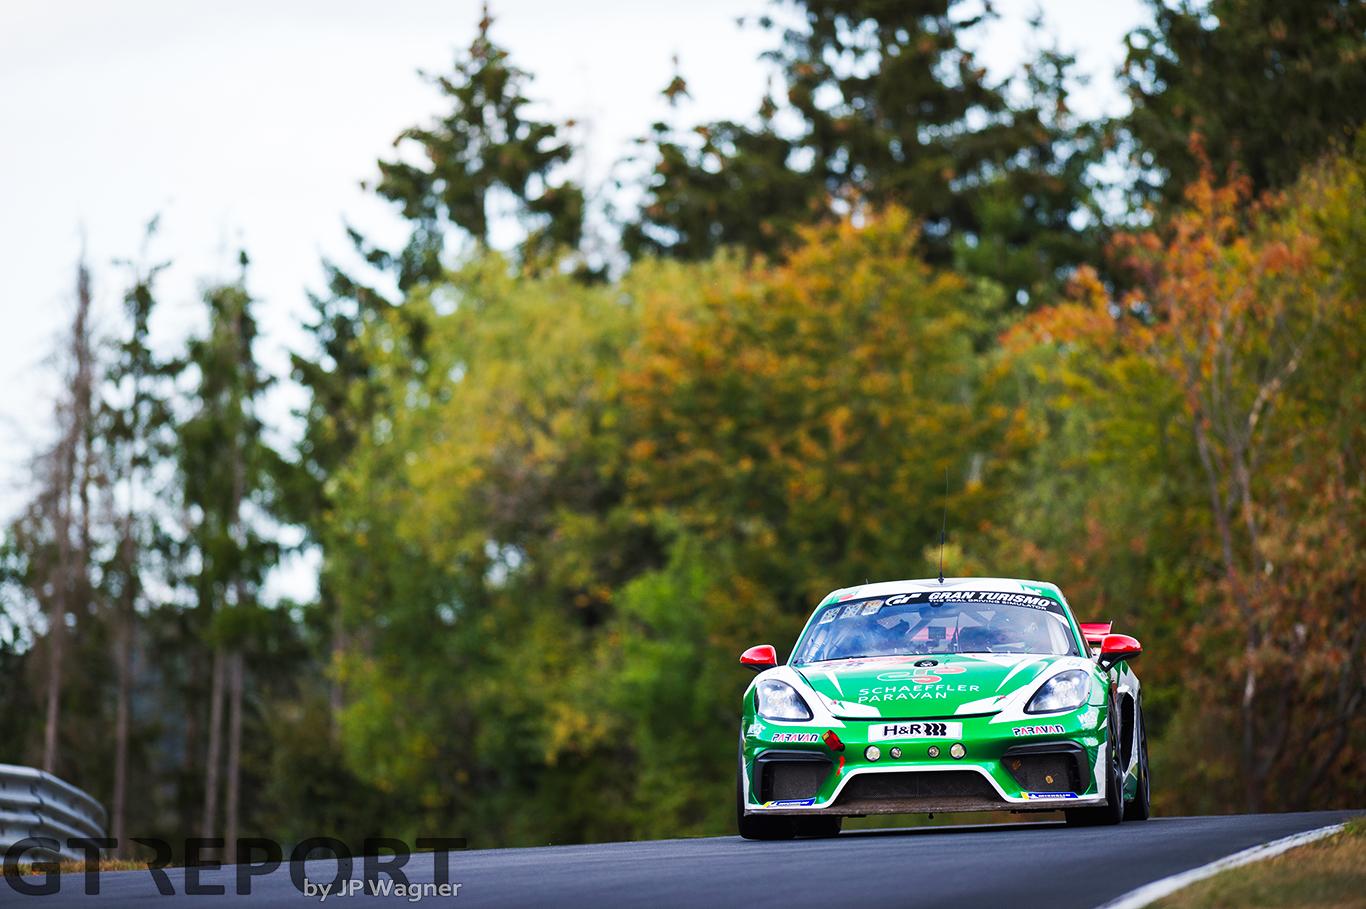 Nürburgring 24 Hours driver report: Tim Scheerbarth – Thursday